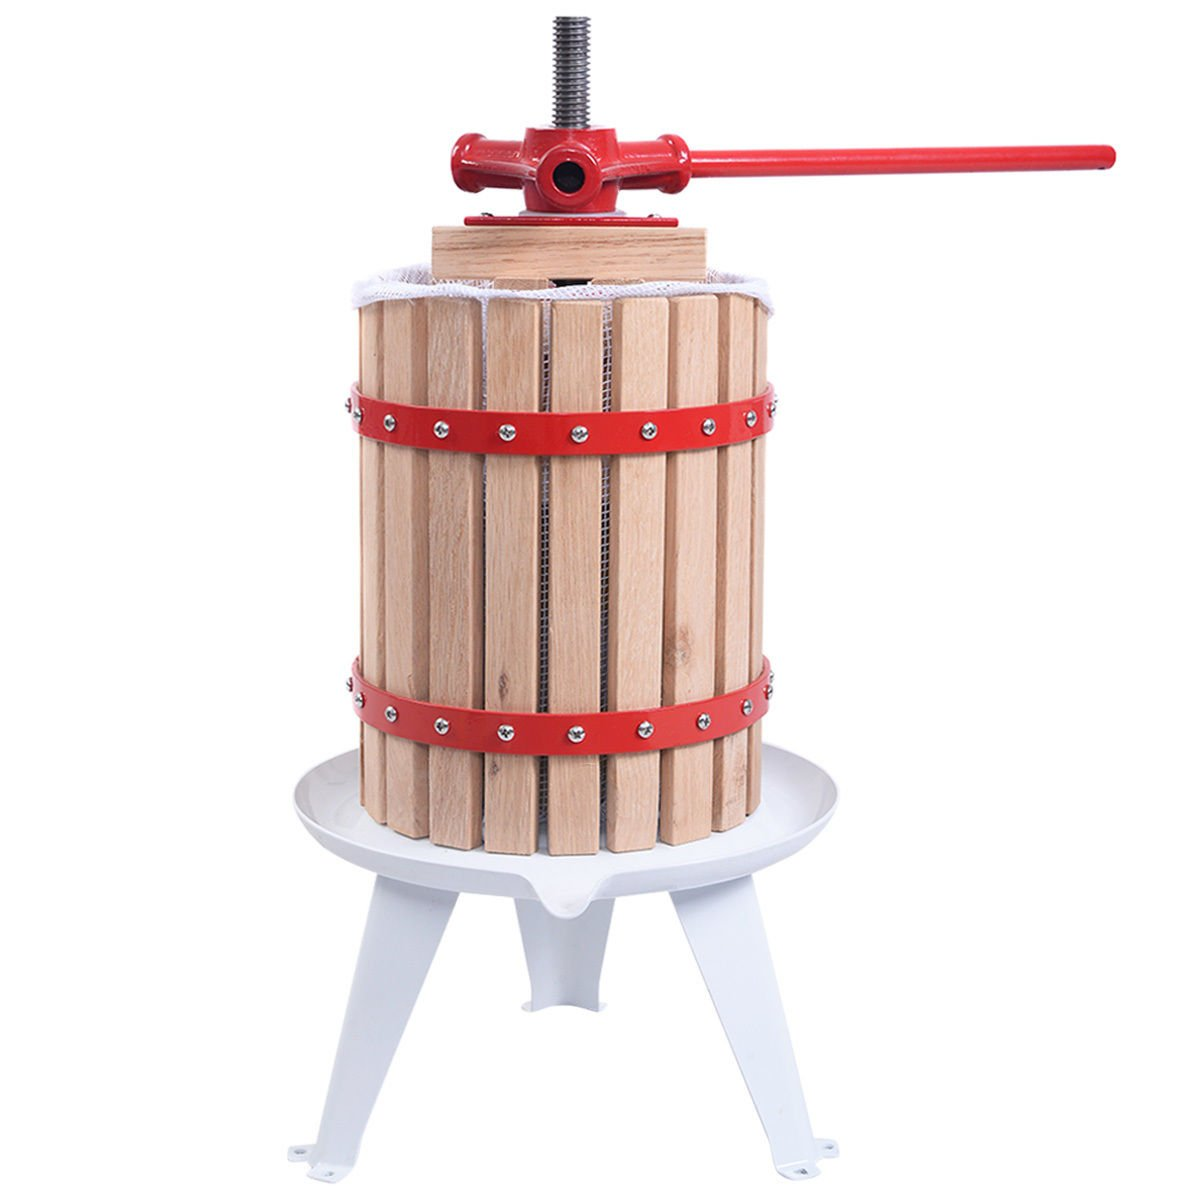 Adumly Size 1.6 Gallon Fruit Wine Press Cider Apple Grape Crusher Juice Maker Tool Wood by Adumly